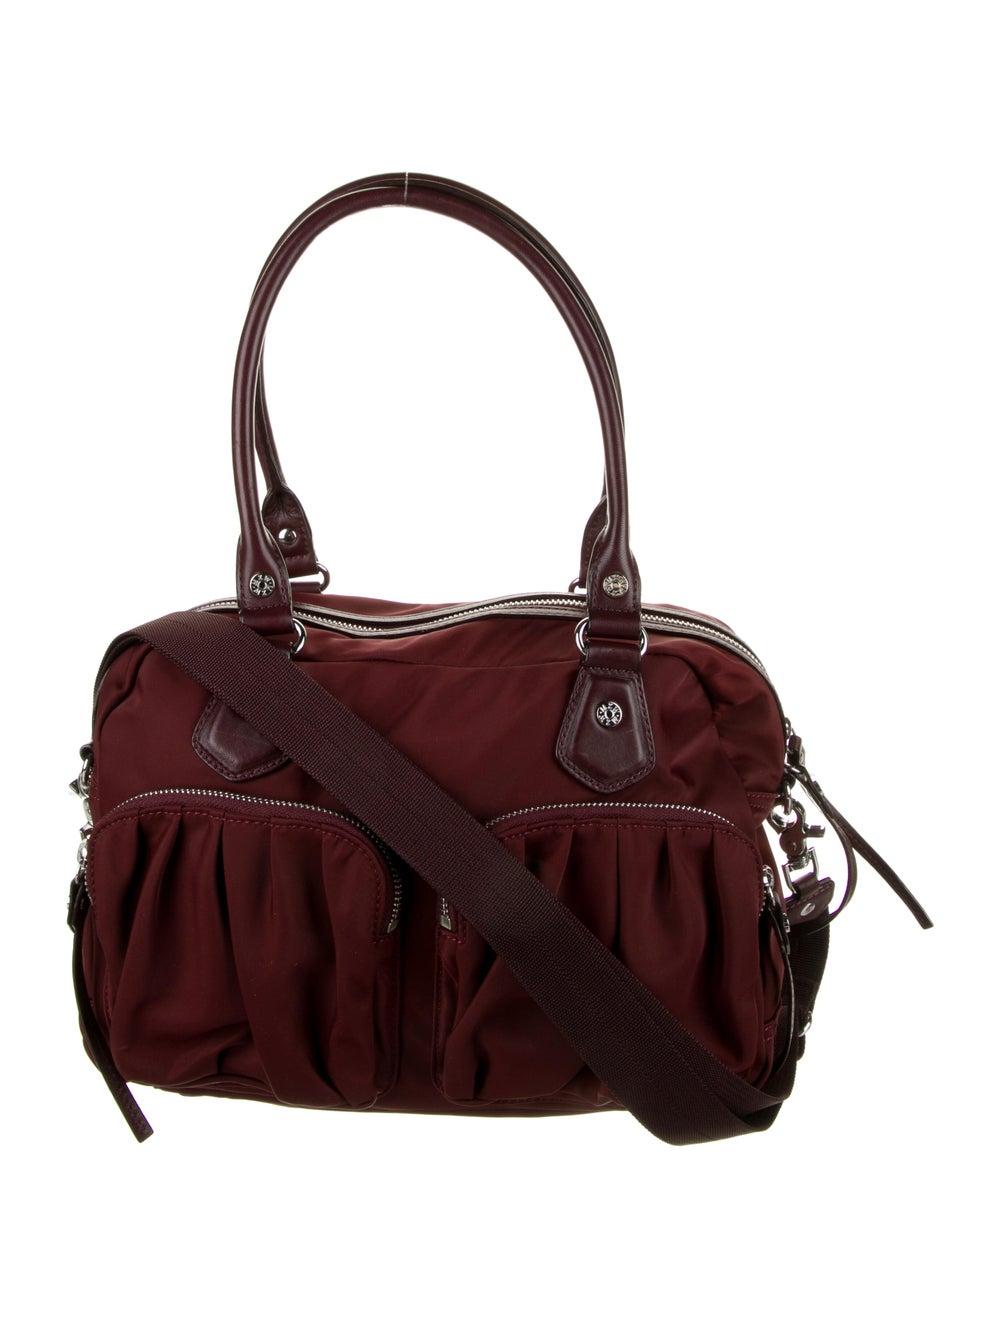 MZ Wallace Nylon Shoulder Bag Red - image 1